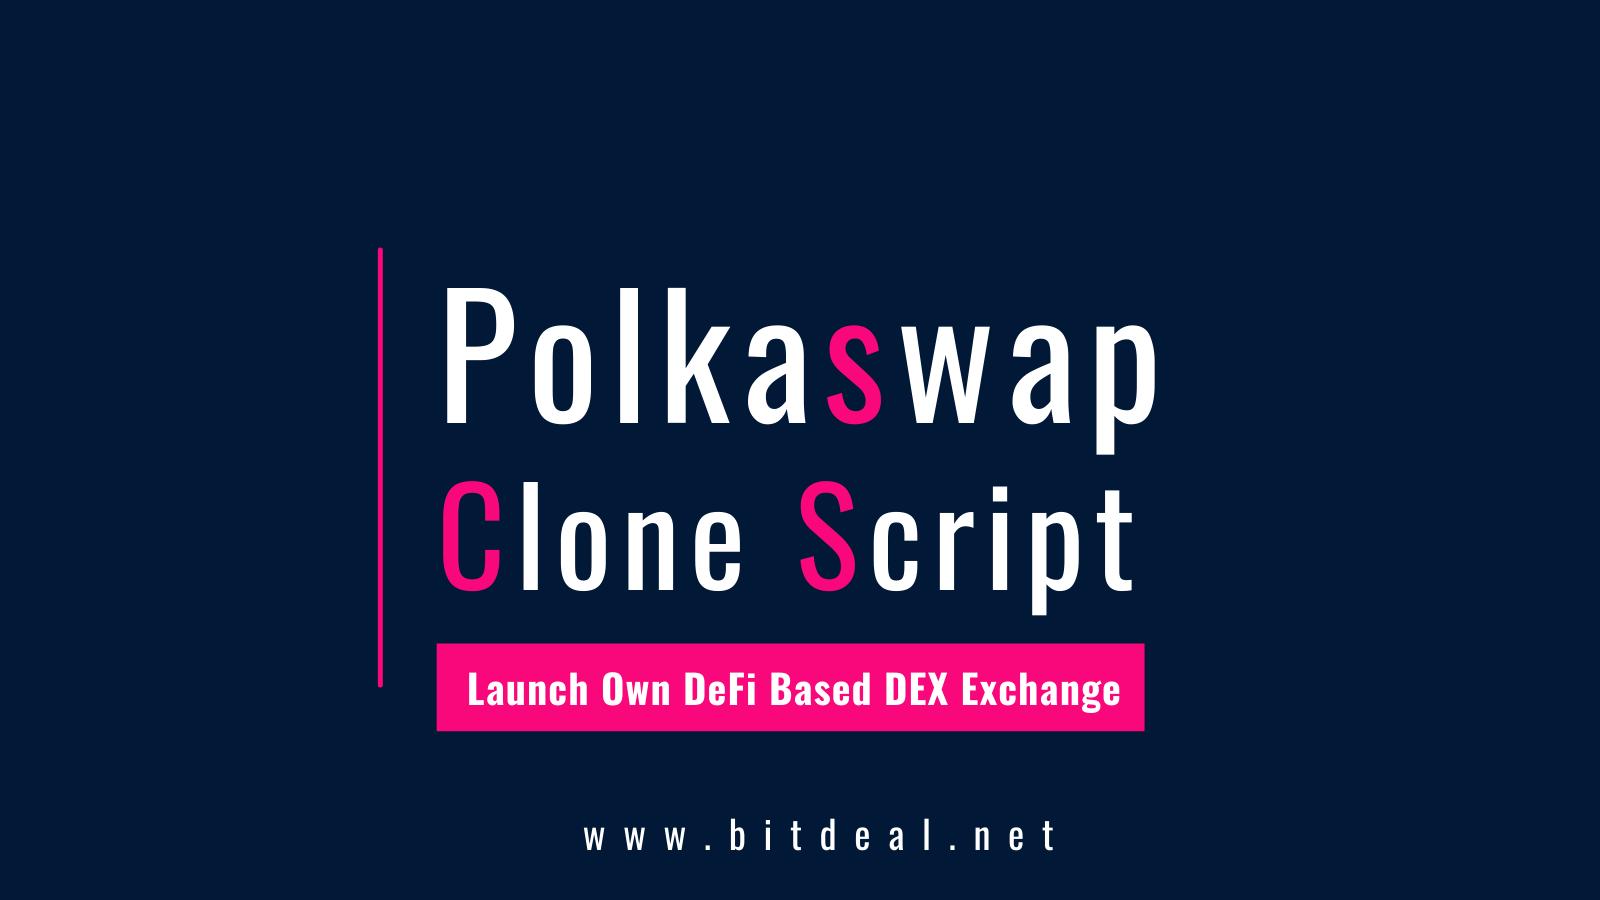 Polkaswap Clone Script - The Perfect Strategy to build a Defi based DEX Exchange like Polkaswap